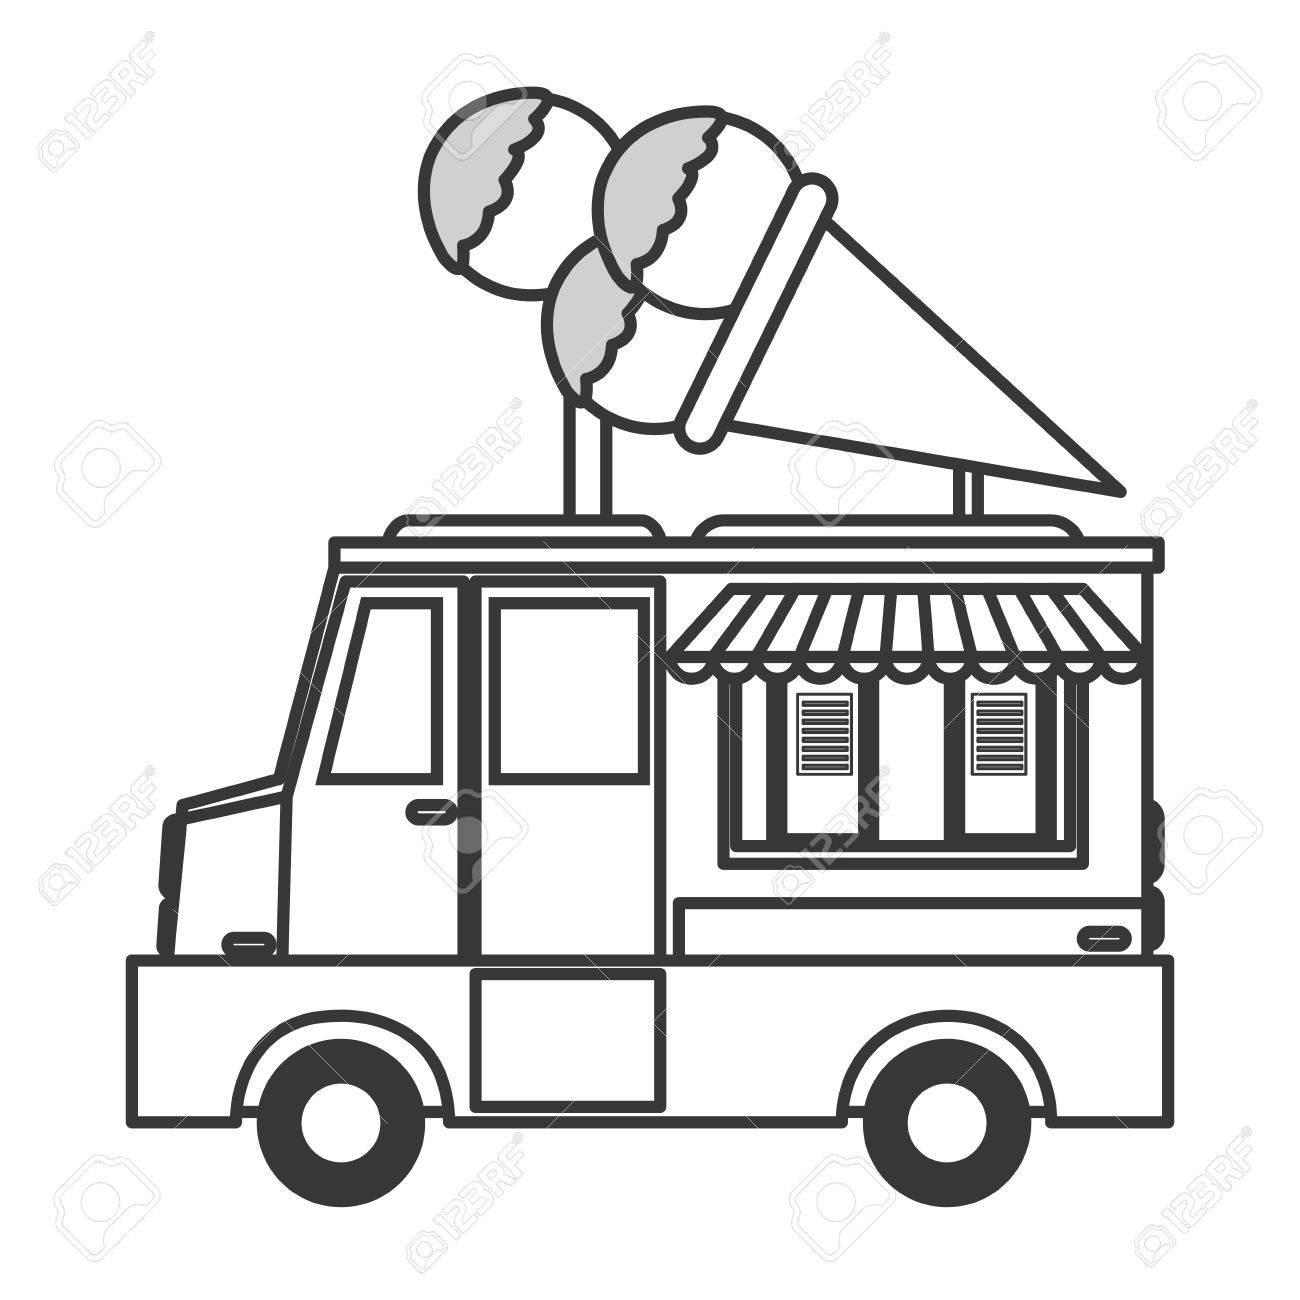 flat design ice cream truck icon vector illustration royalty free rh 123rf com